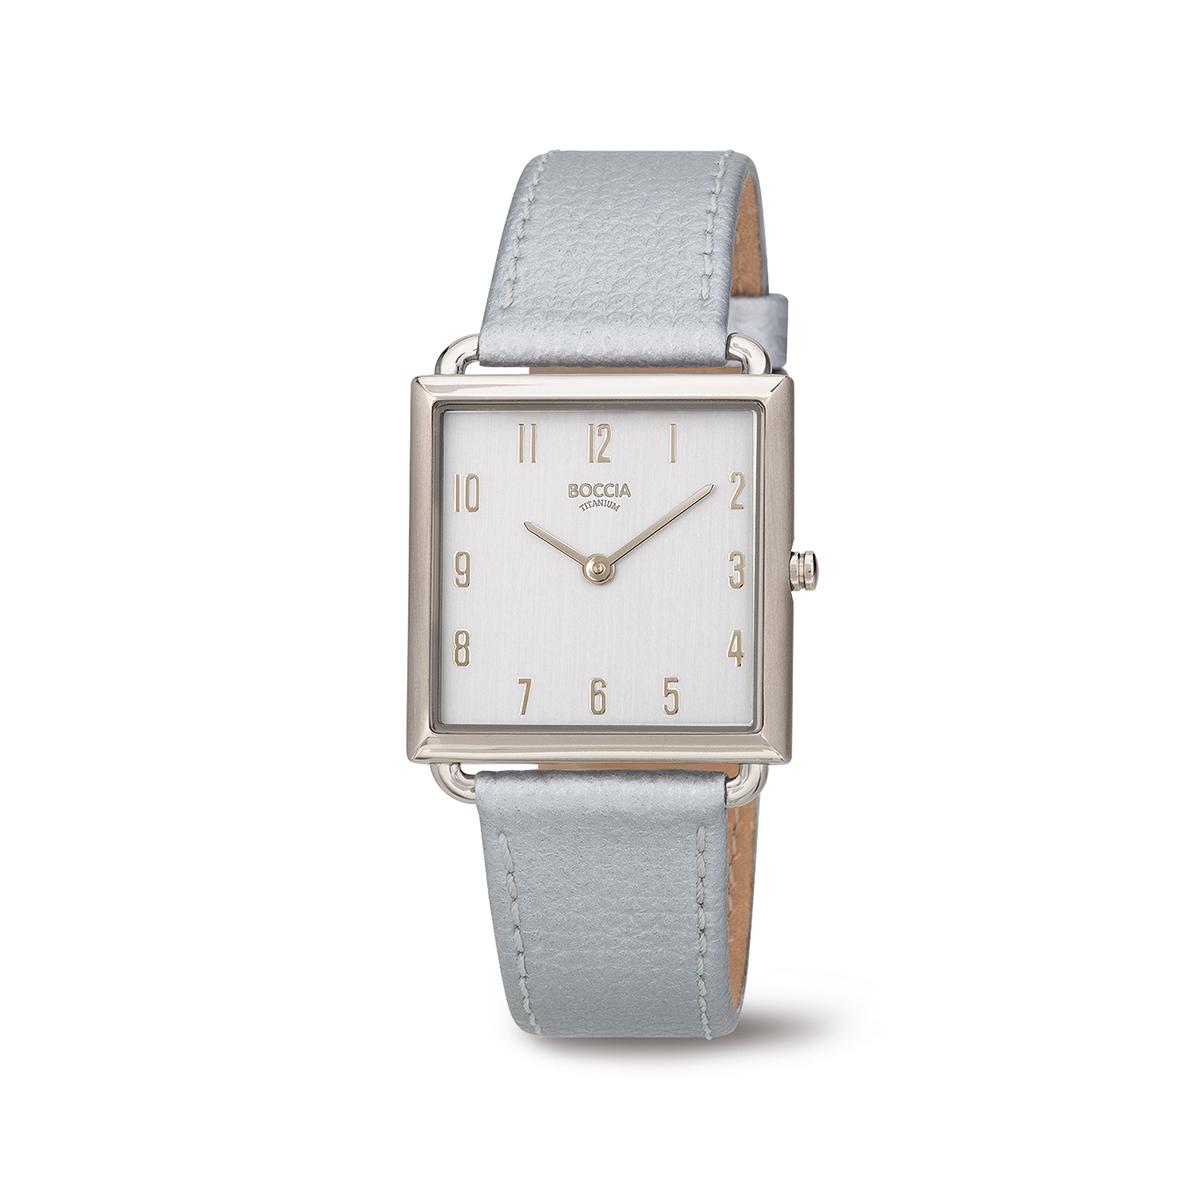 Boccia Titanium 3305.01 horloge Leer Zilverkleurig 29 mm